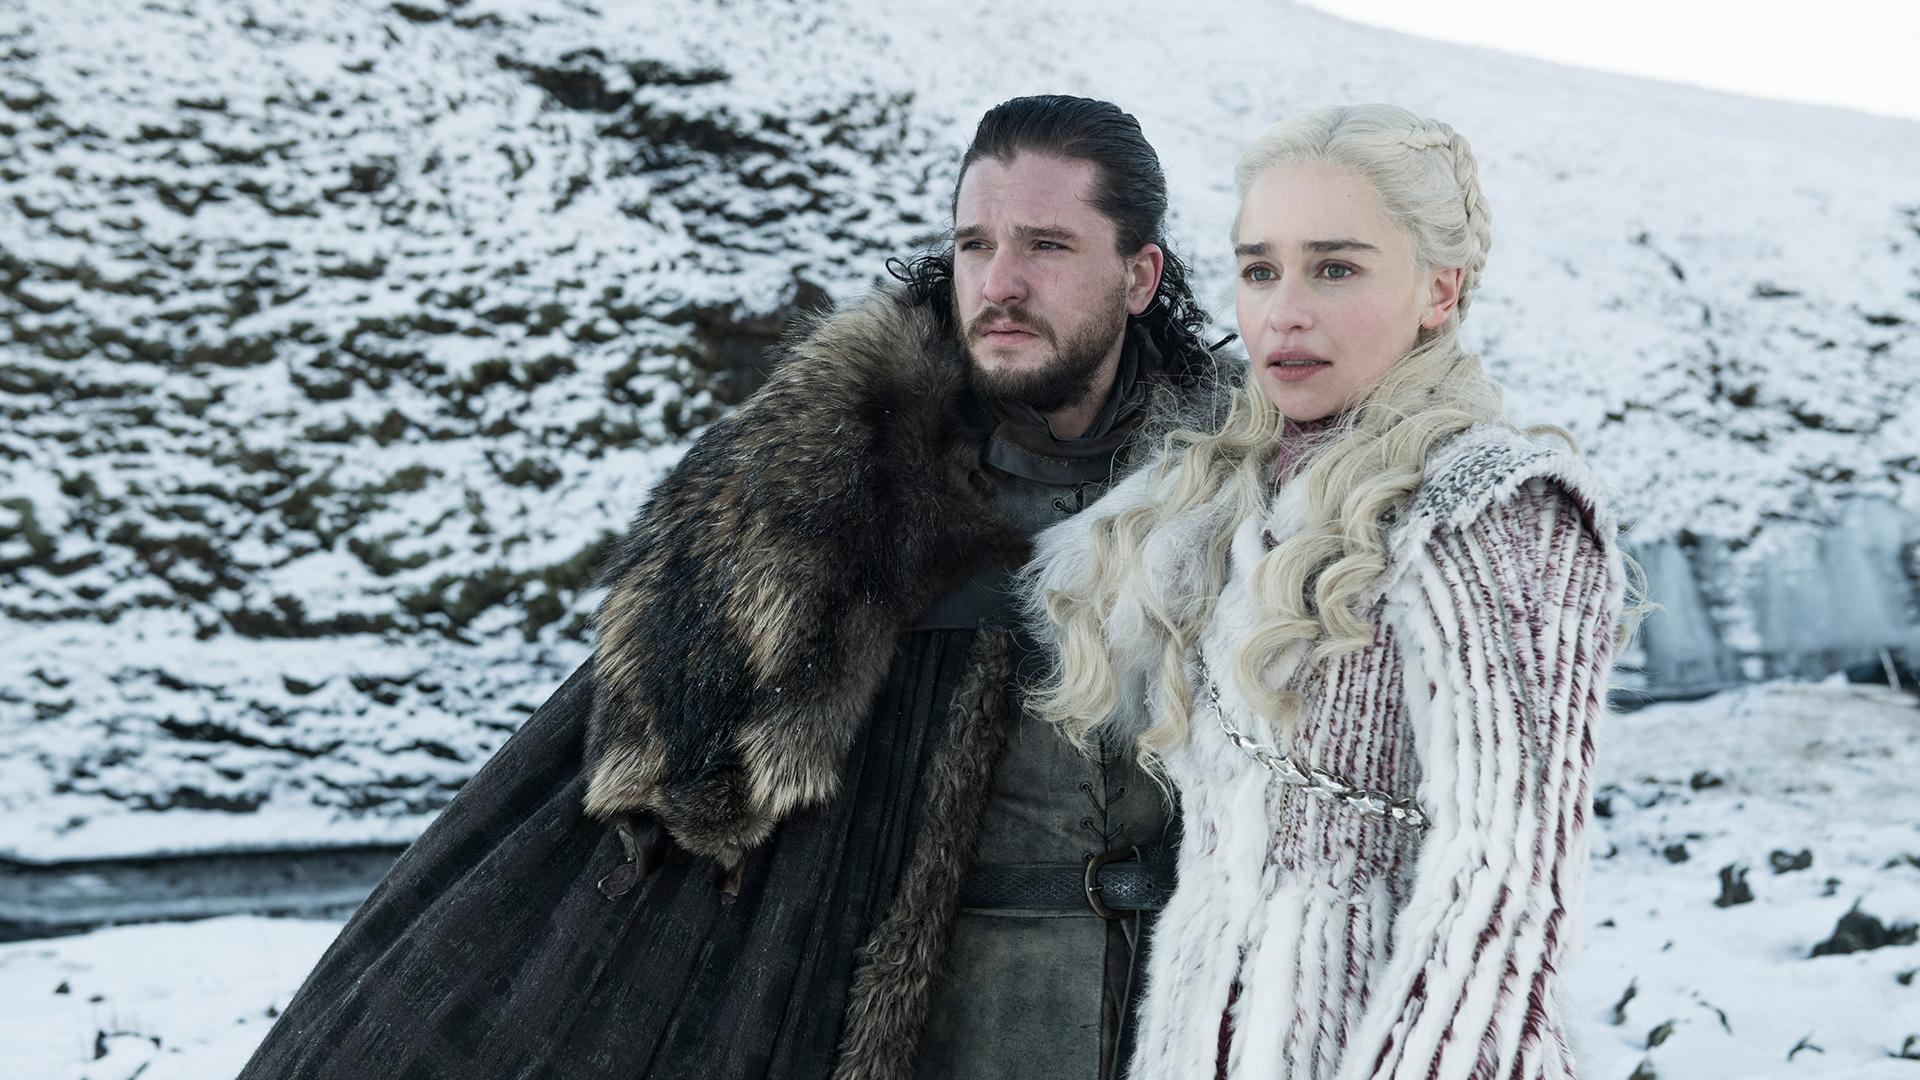 Kit Harington as Jon Snow and Emilia Clarke as Daenerys Targaryen – Photo: Helen Sloan/HBO